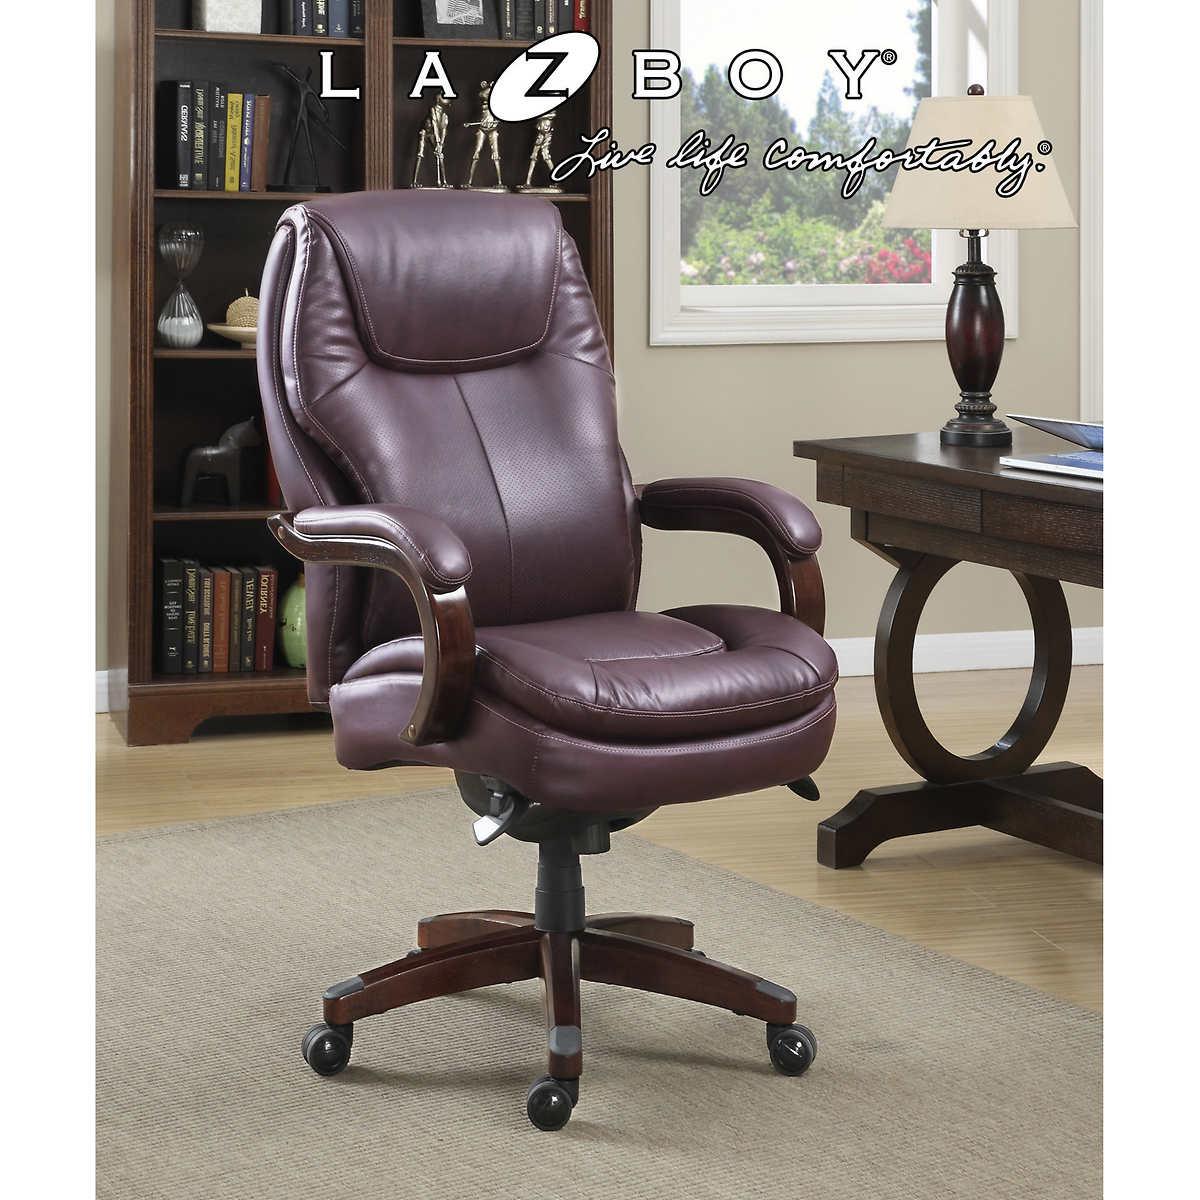 La Z Boy Aventine Big Tall Air Technology Executive Office Chair